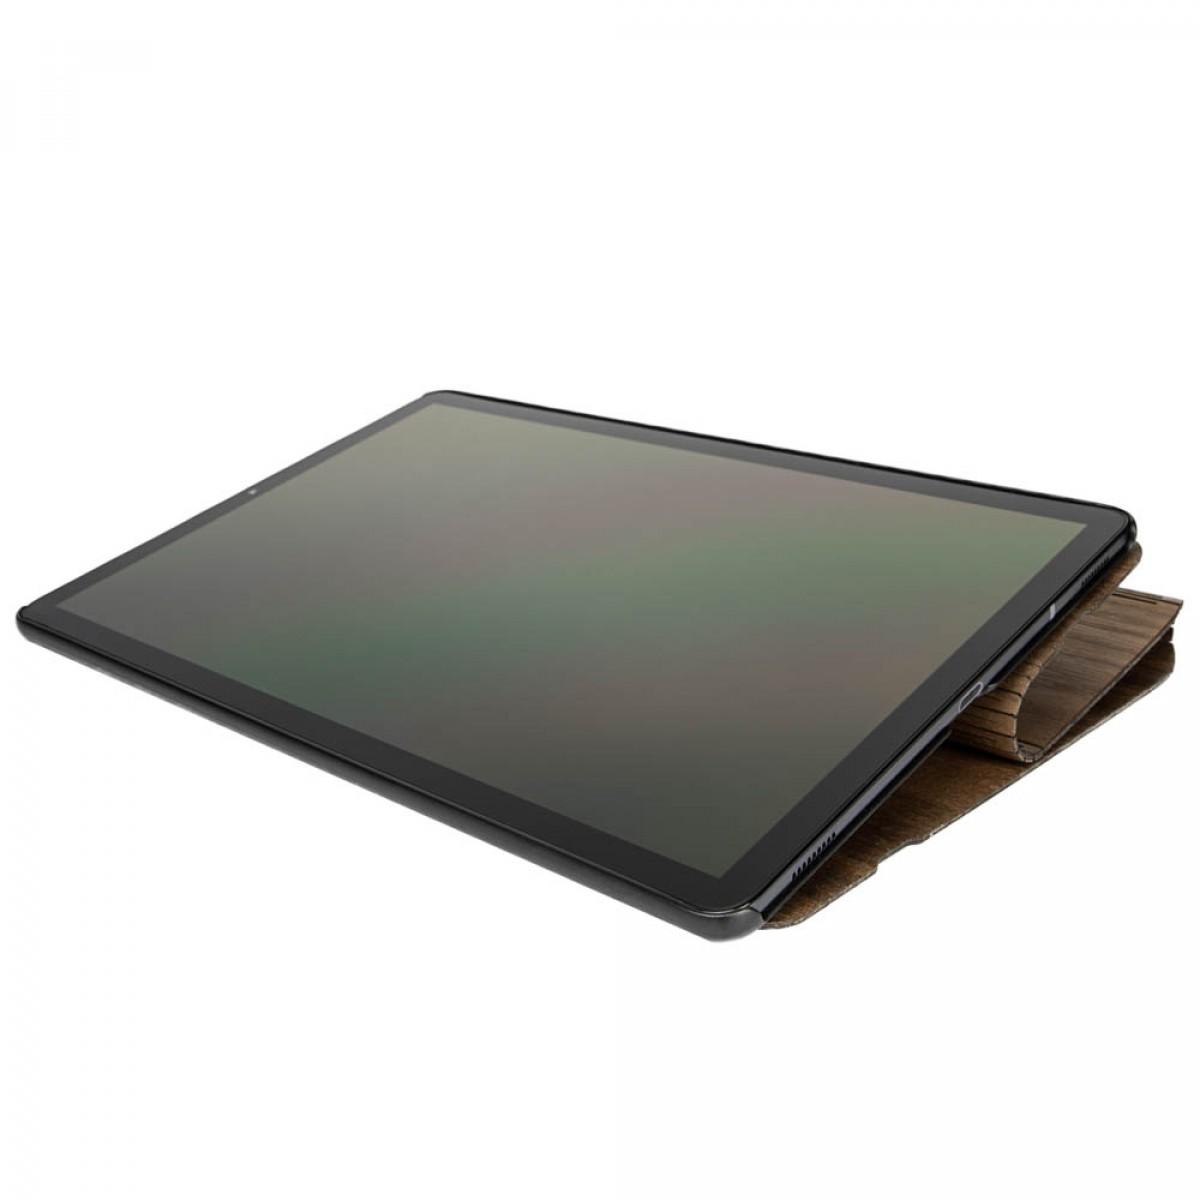 JUNGHOLZ Design WoodCase, Tablet, Walnuss, Samsung Galaxy Tab S5e